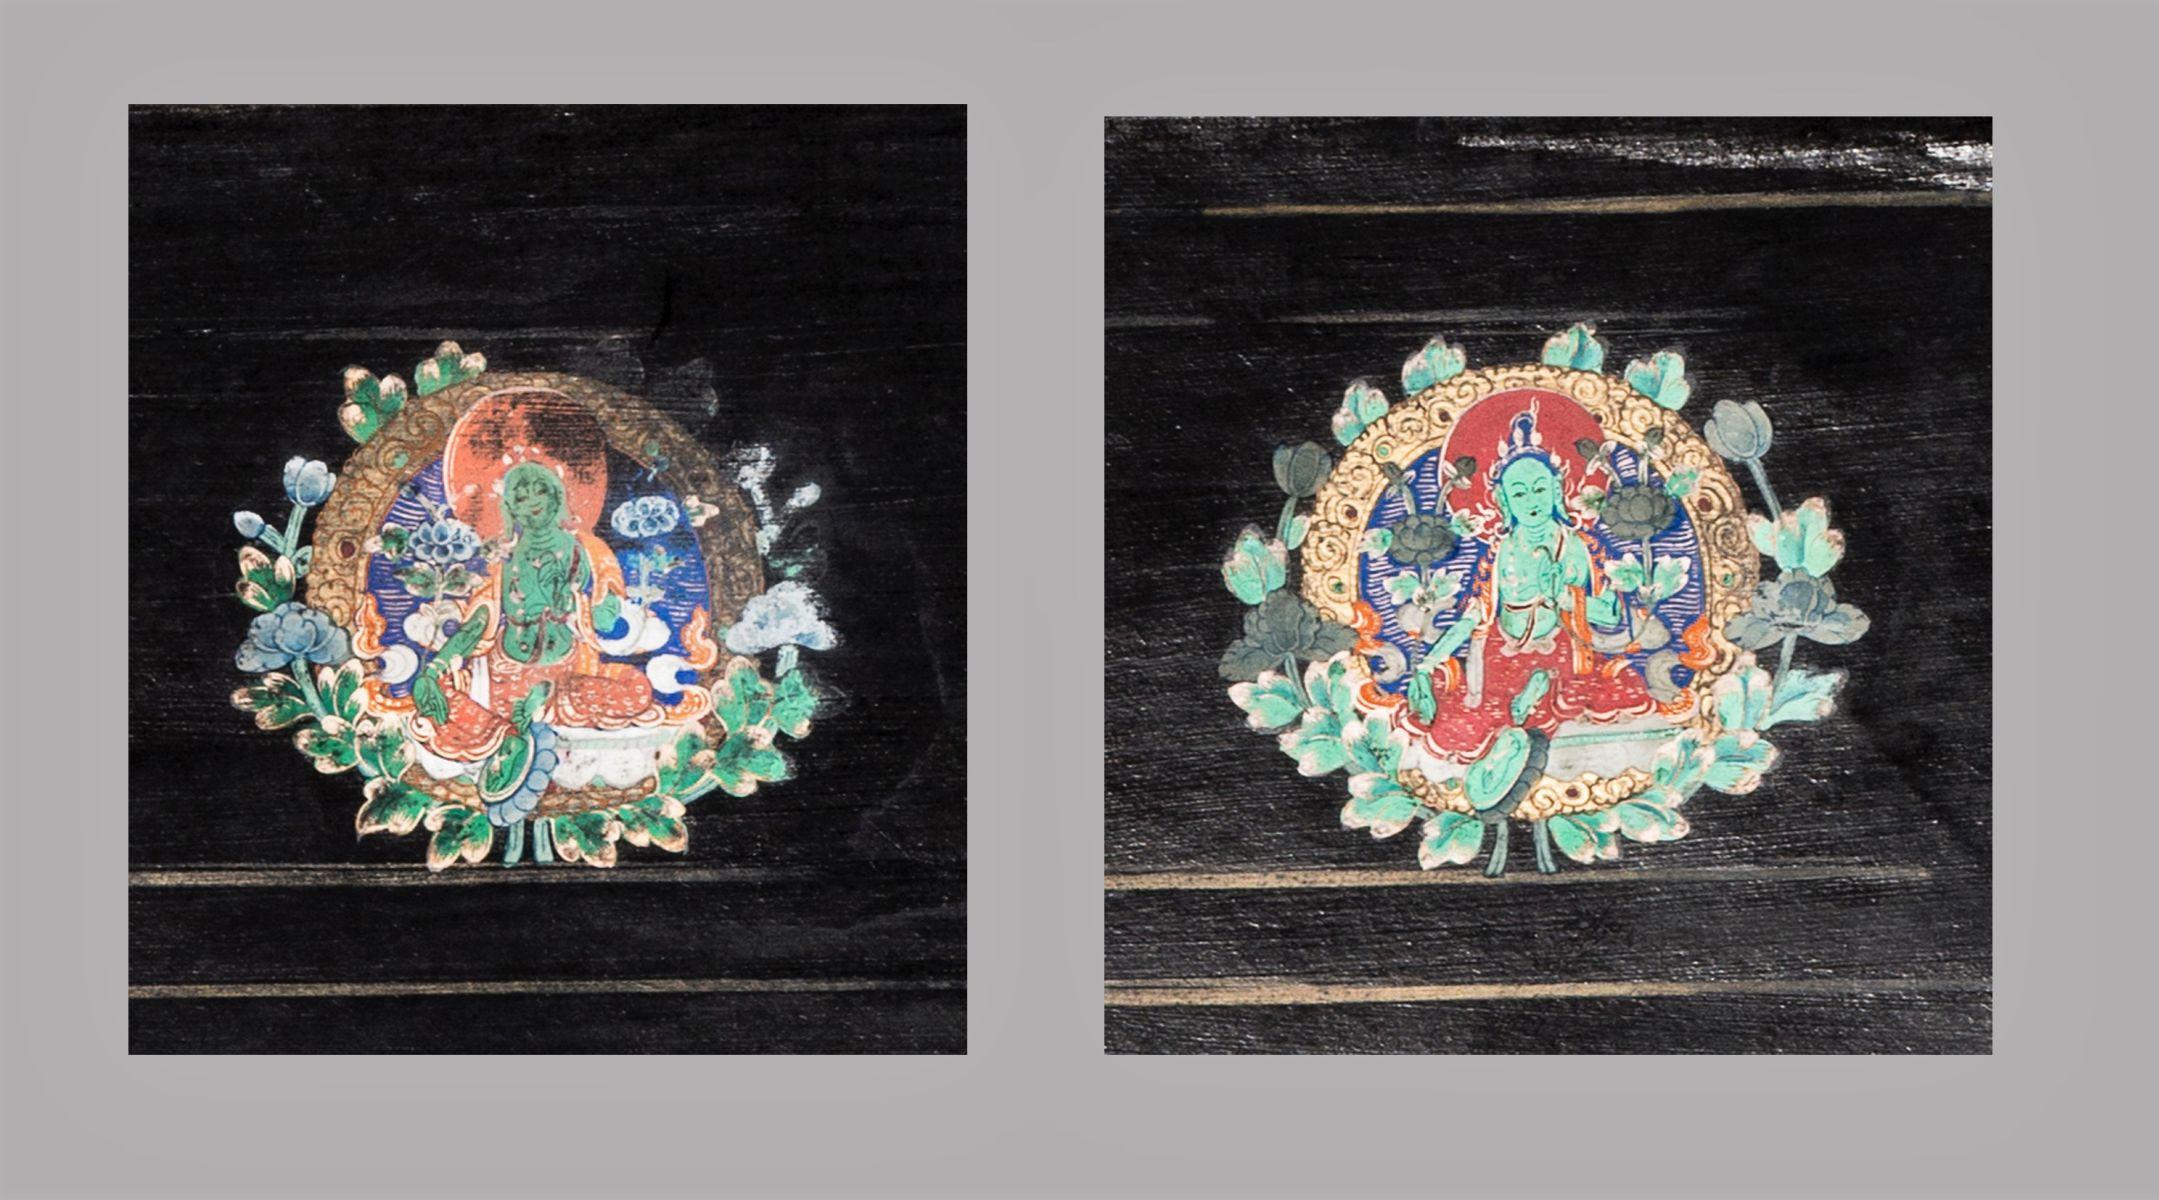 #195 Two Tsakali of green Tara | Zwei Tsakali von grüner Tara Image